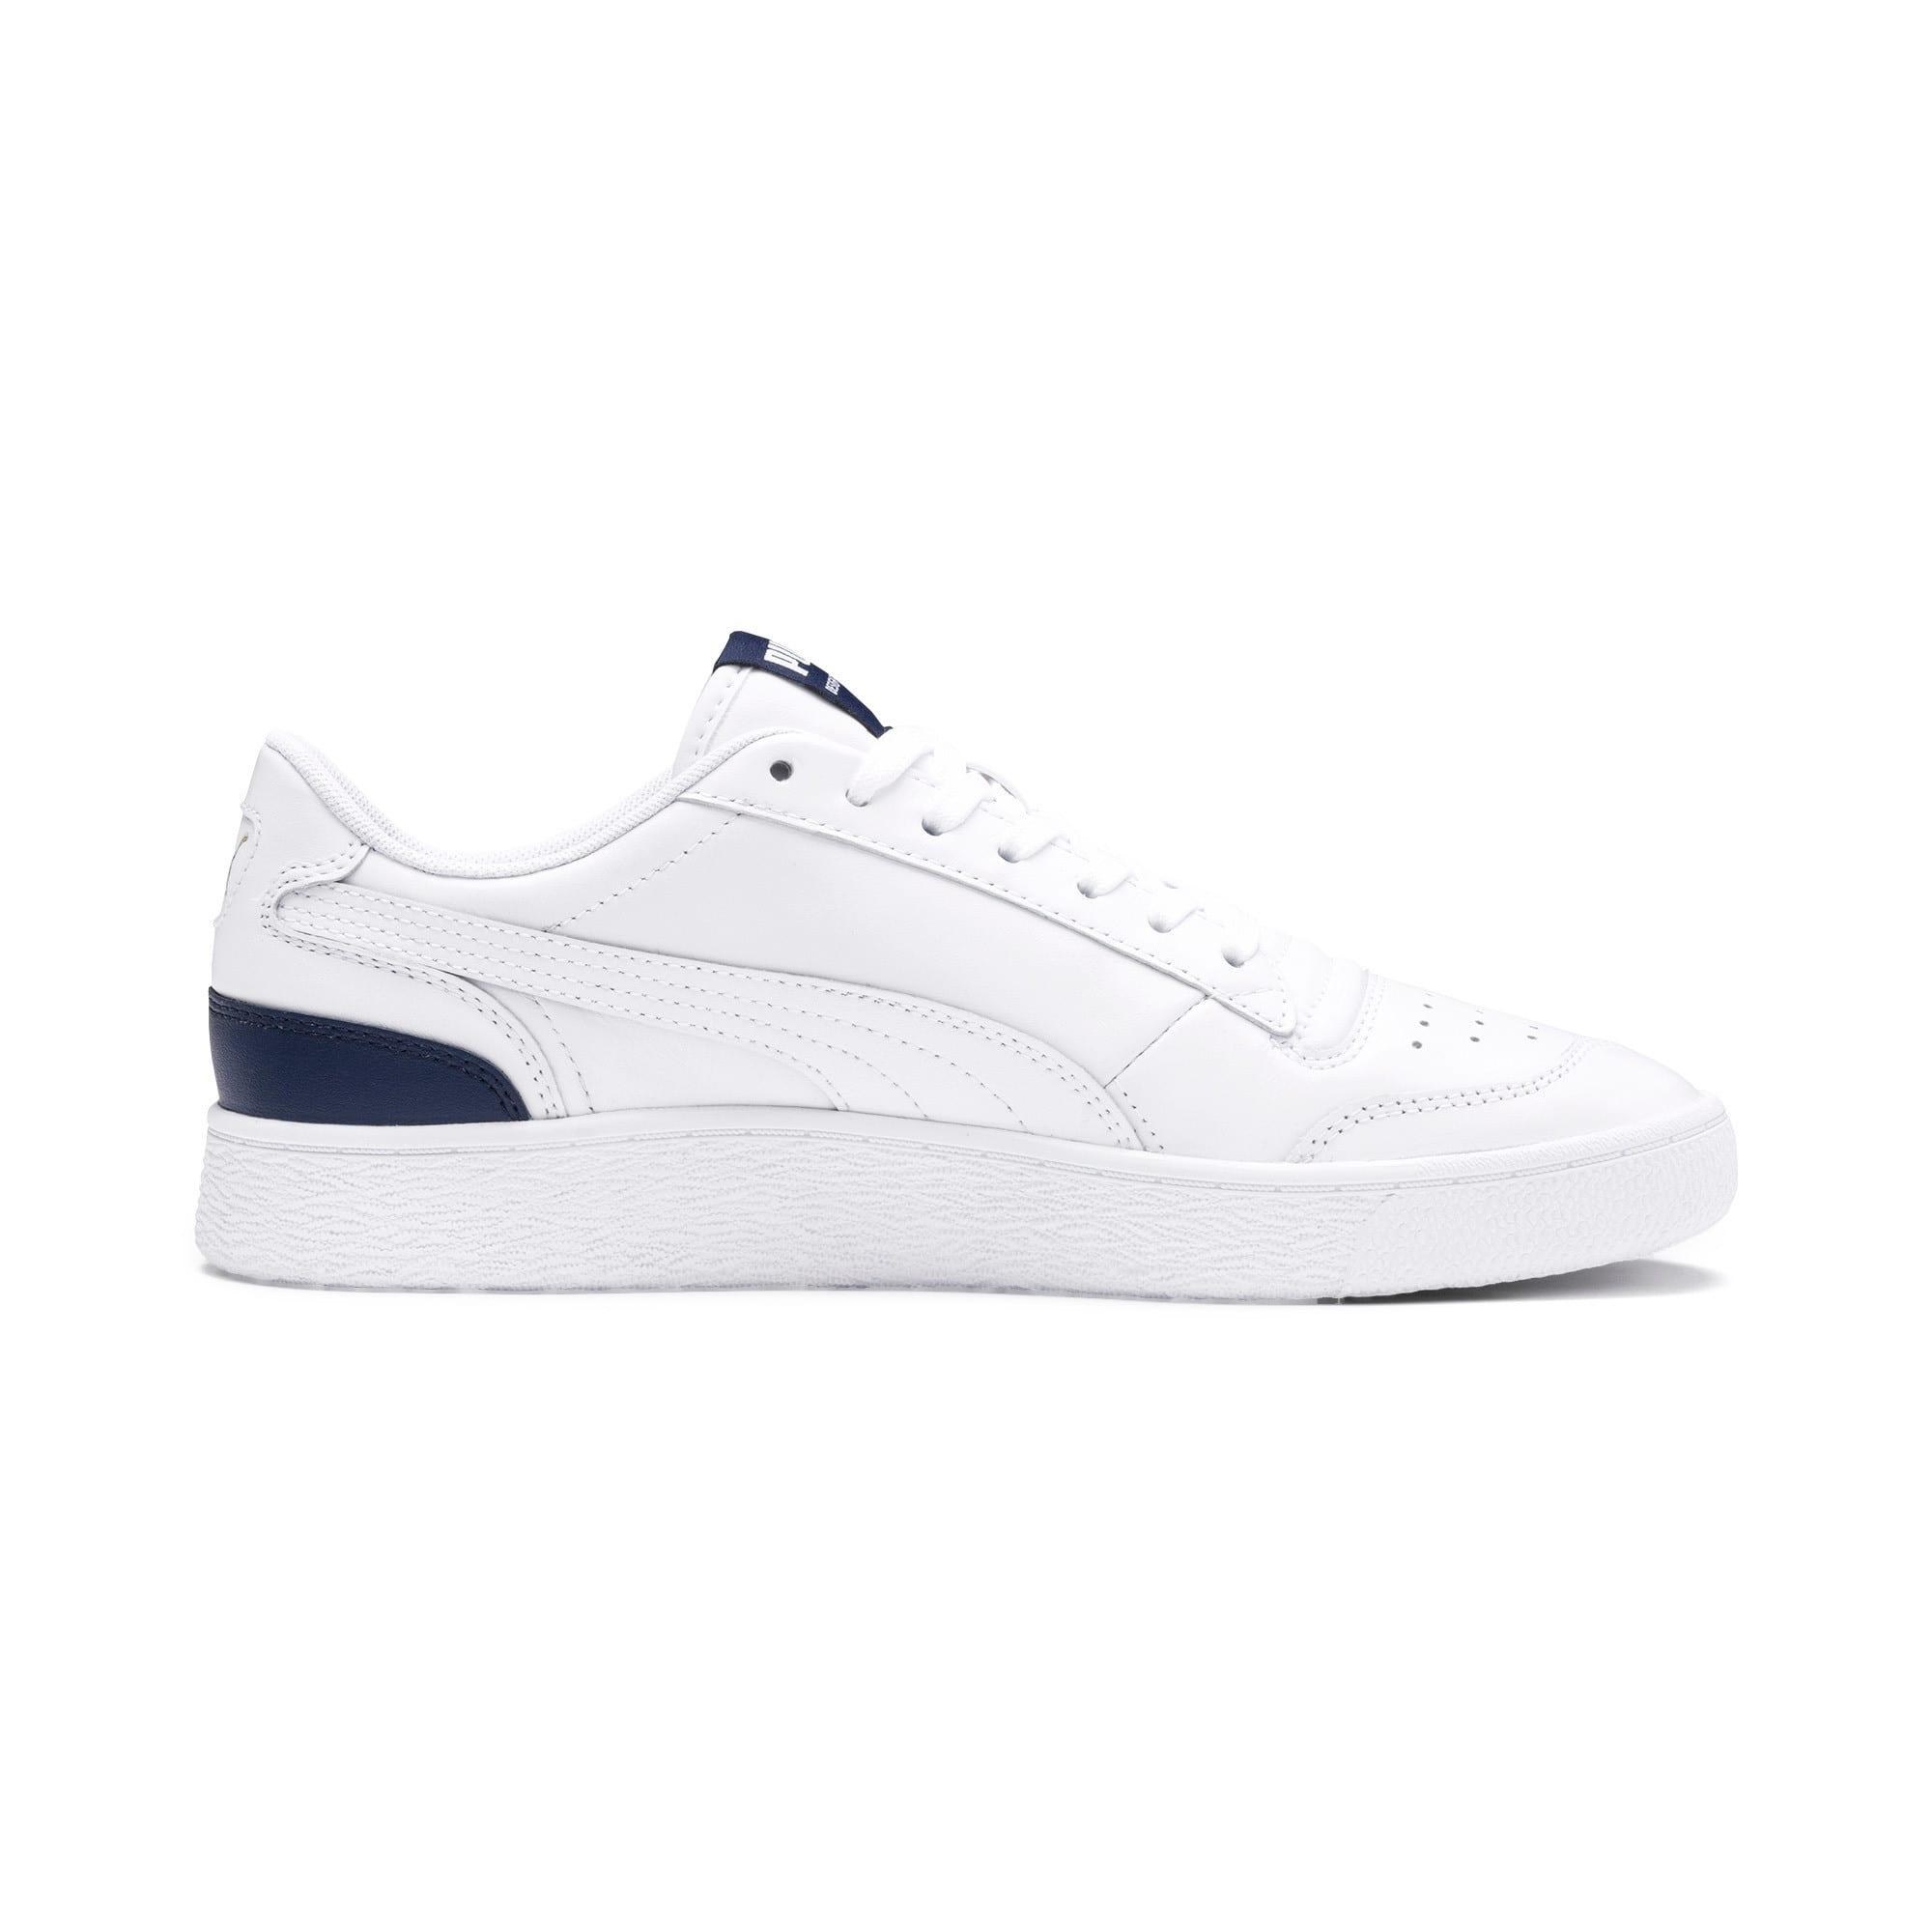 Thumbnail 5 of Ralph Sampson Lo Sneakers, Puma Wht-Peacoat-Puma Wht, medium